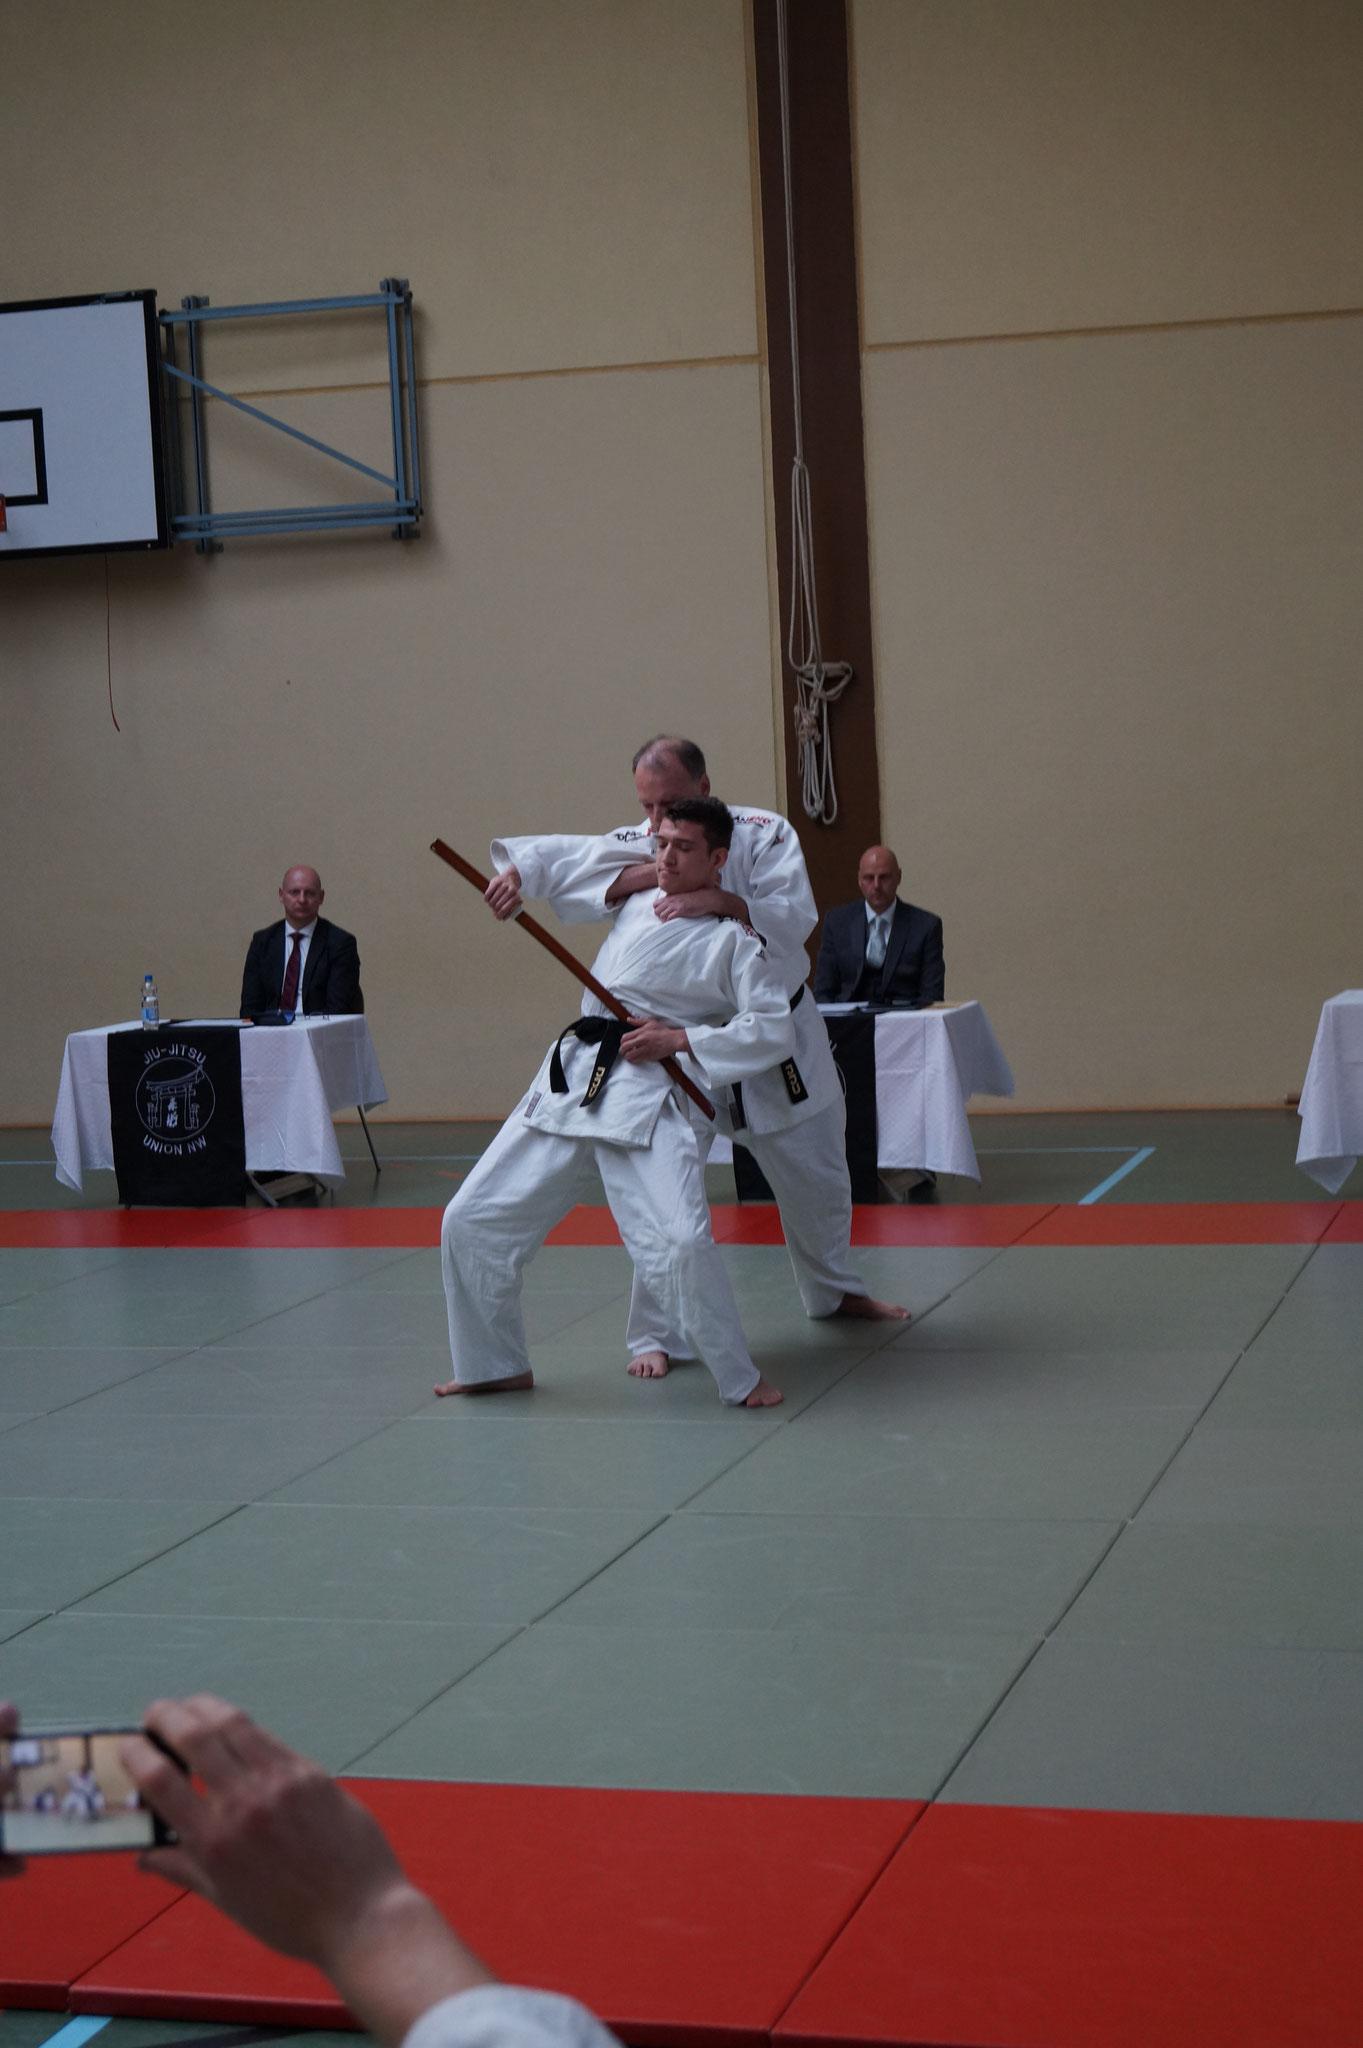 JJU NW - Jiu Jitsu - Moderne Selbstverteidigung